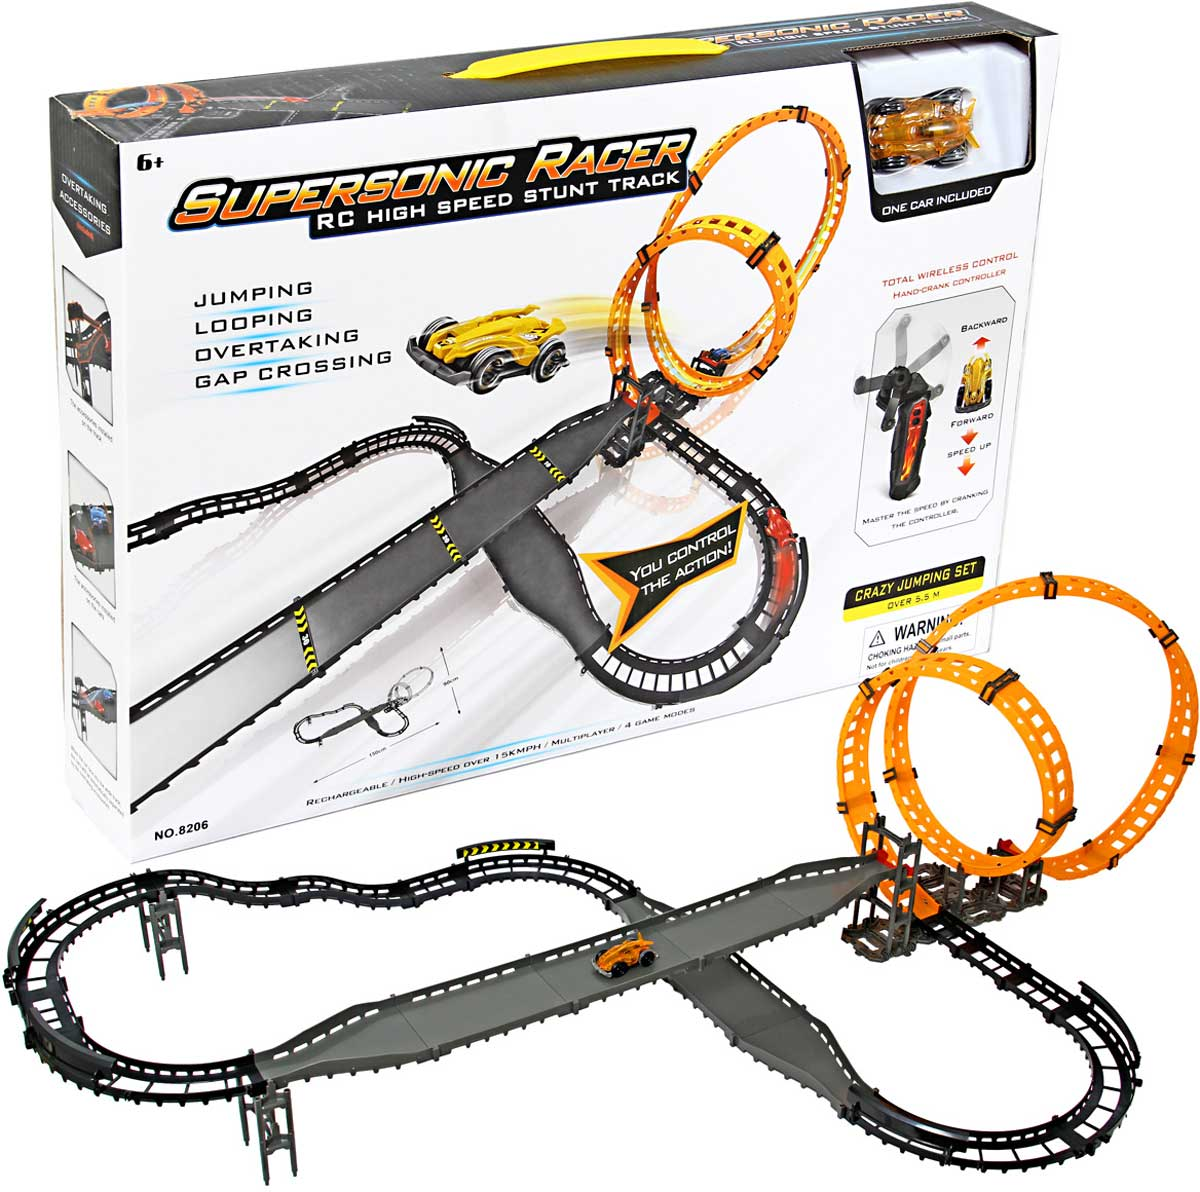 Veld-Co Трек Supersonic Racer цвет серый оранжевый - Транспорт, машинки